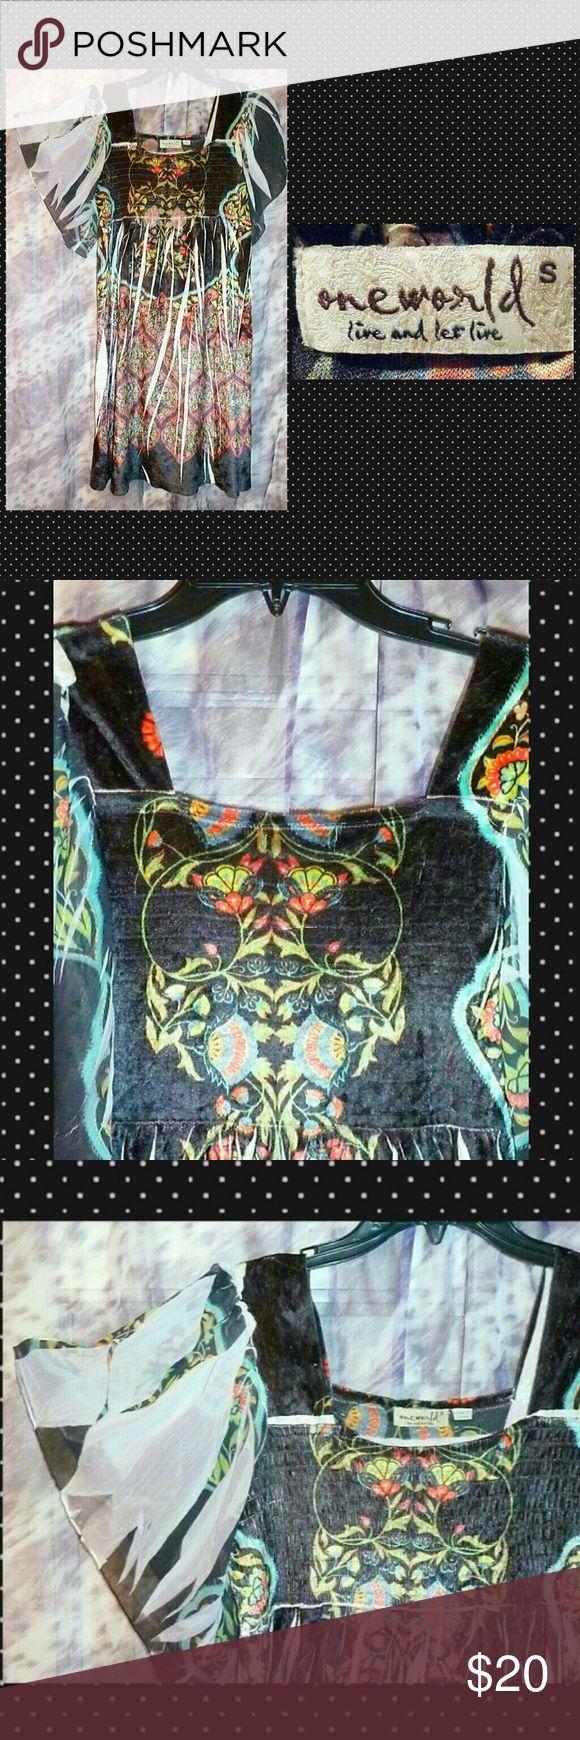 I just added this listing on Poshmark: Blk/Multicolor Velvet & Chiffon Knit Dress Sz Sml. #shopmycloset #poshmark #fashion #shopping #style #forsale #ONE WORLD #Dresses & Skirts